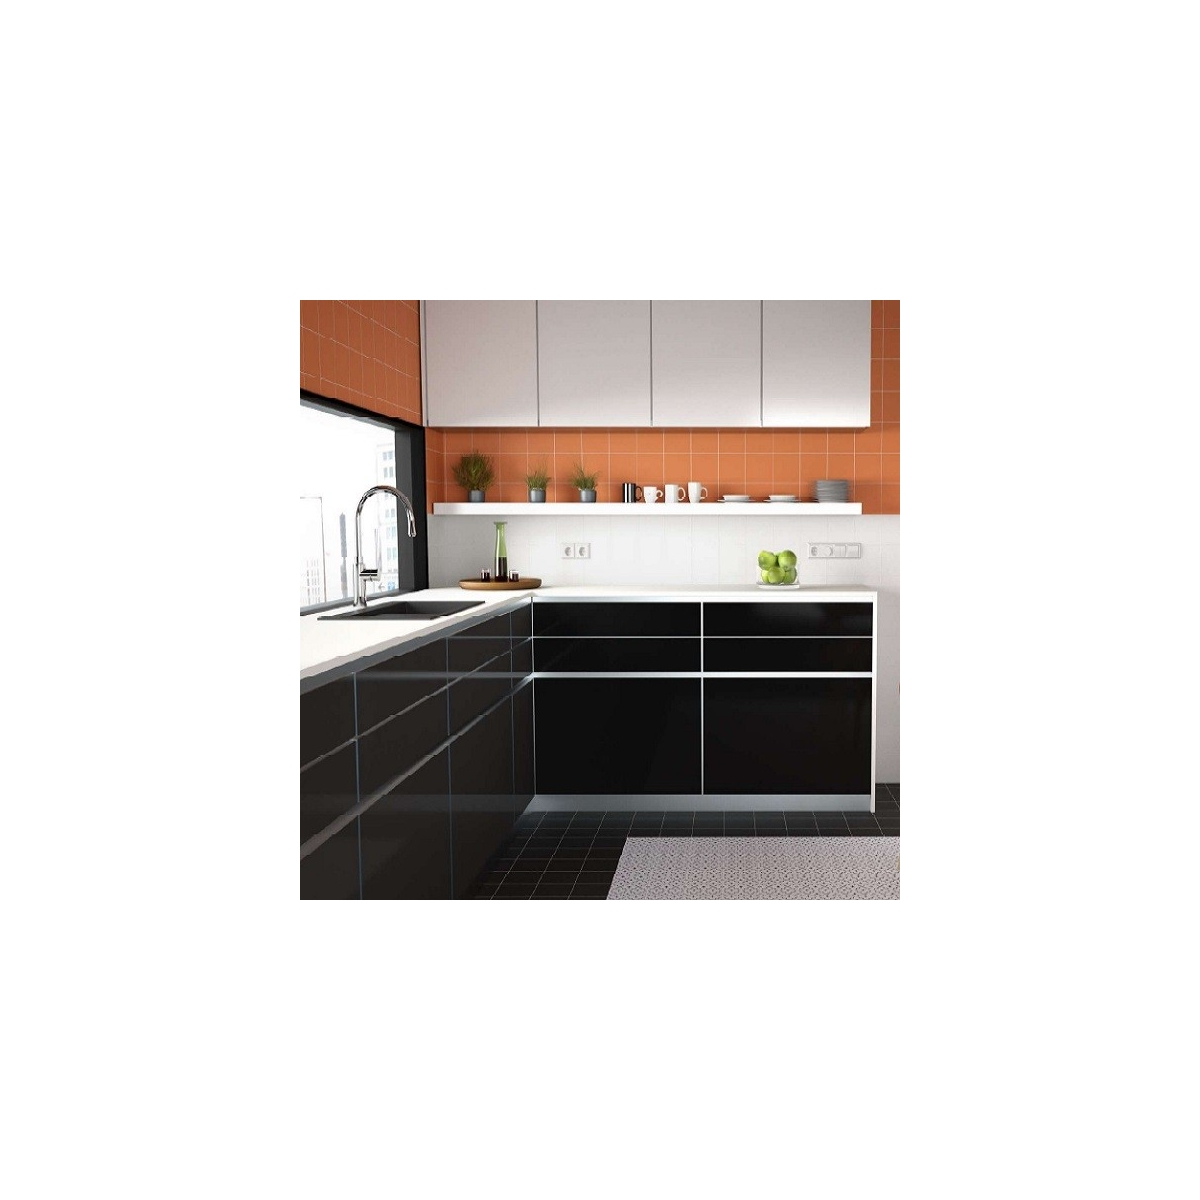 Rainbow Negro 15x15 (m2) Pissano